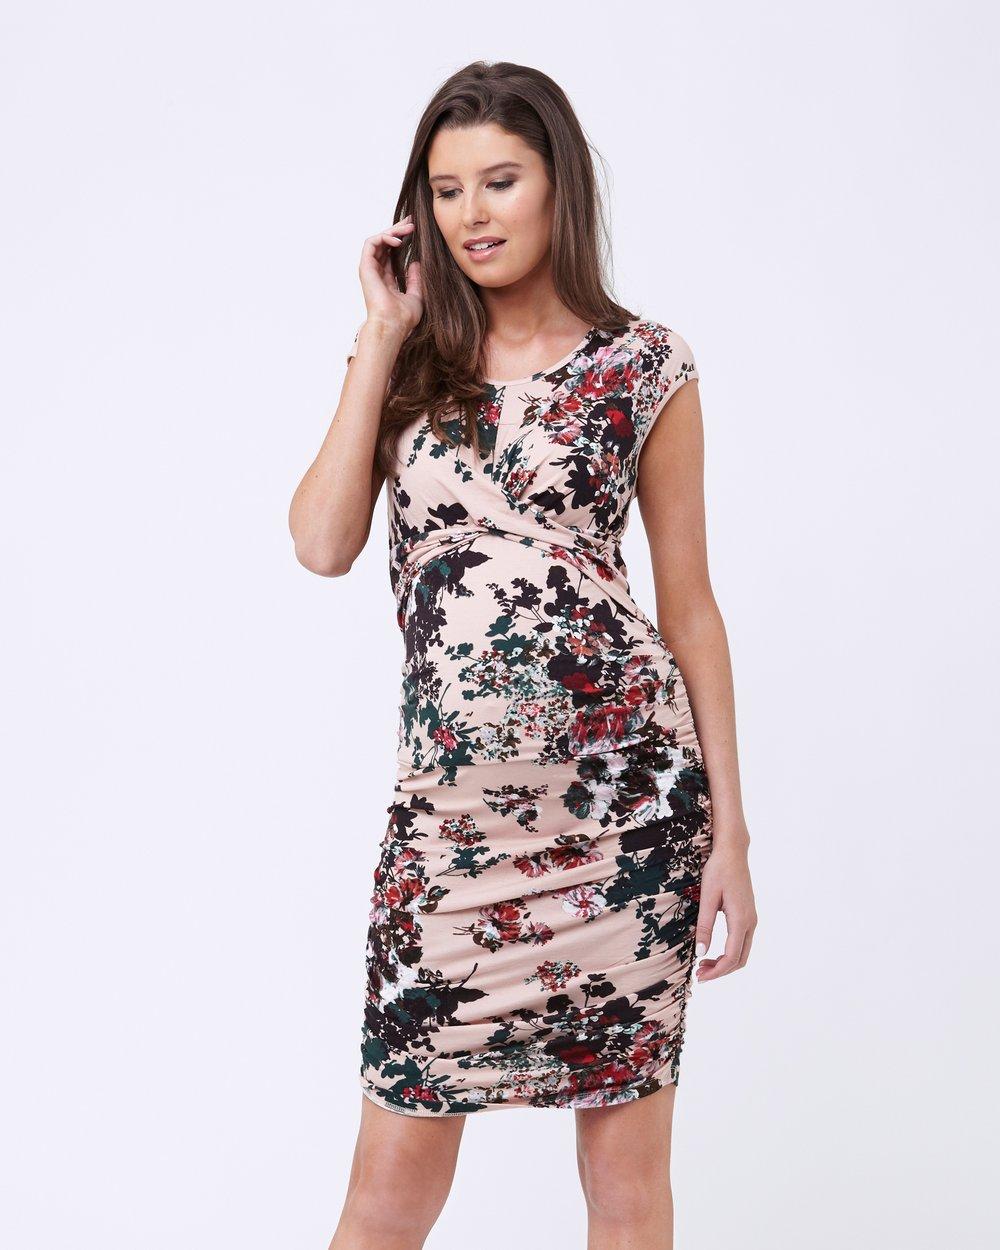 Womens maternity dresses online the iconic australia ombrellifo Choice Image